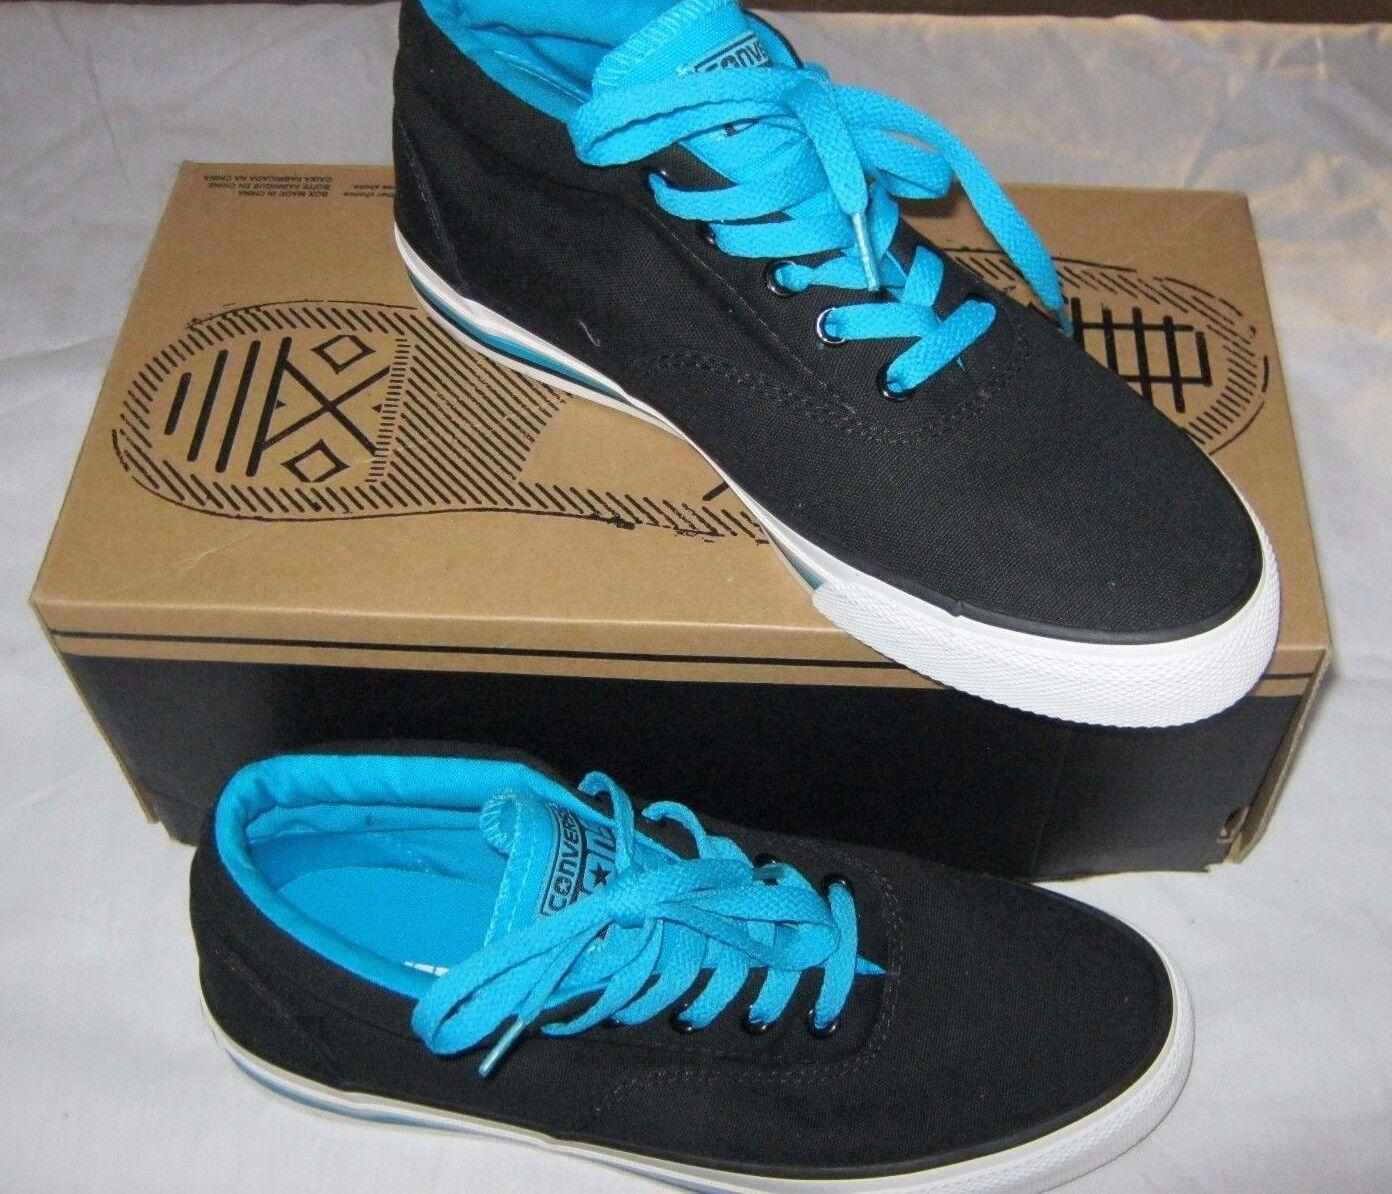 Skateboarding B Boston Converse Cons Lo Top Sneakers Shoes Mens 8 Womens 9.5